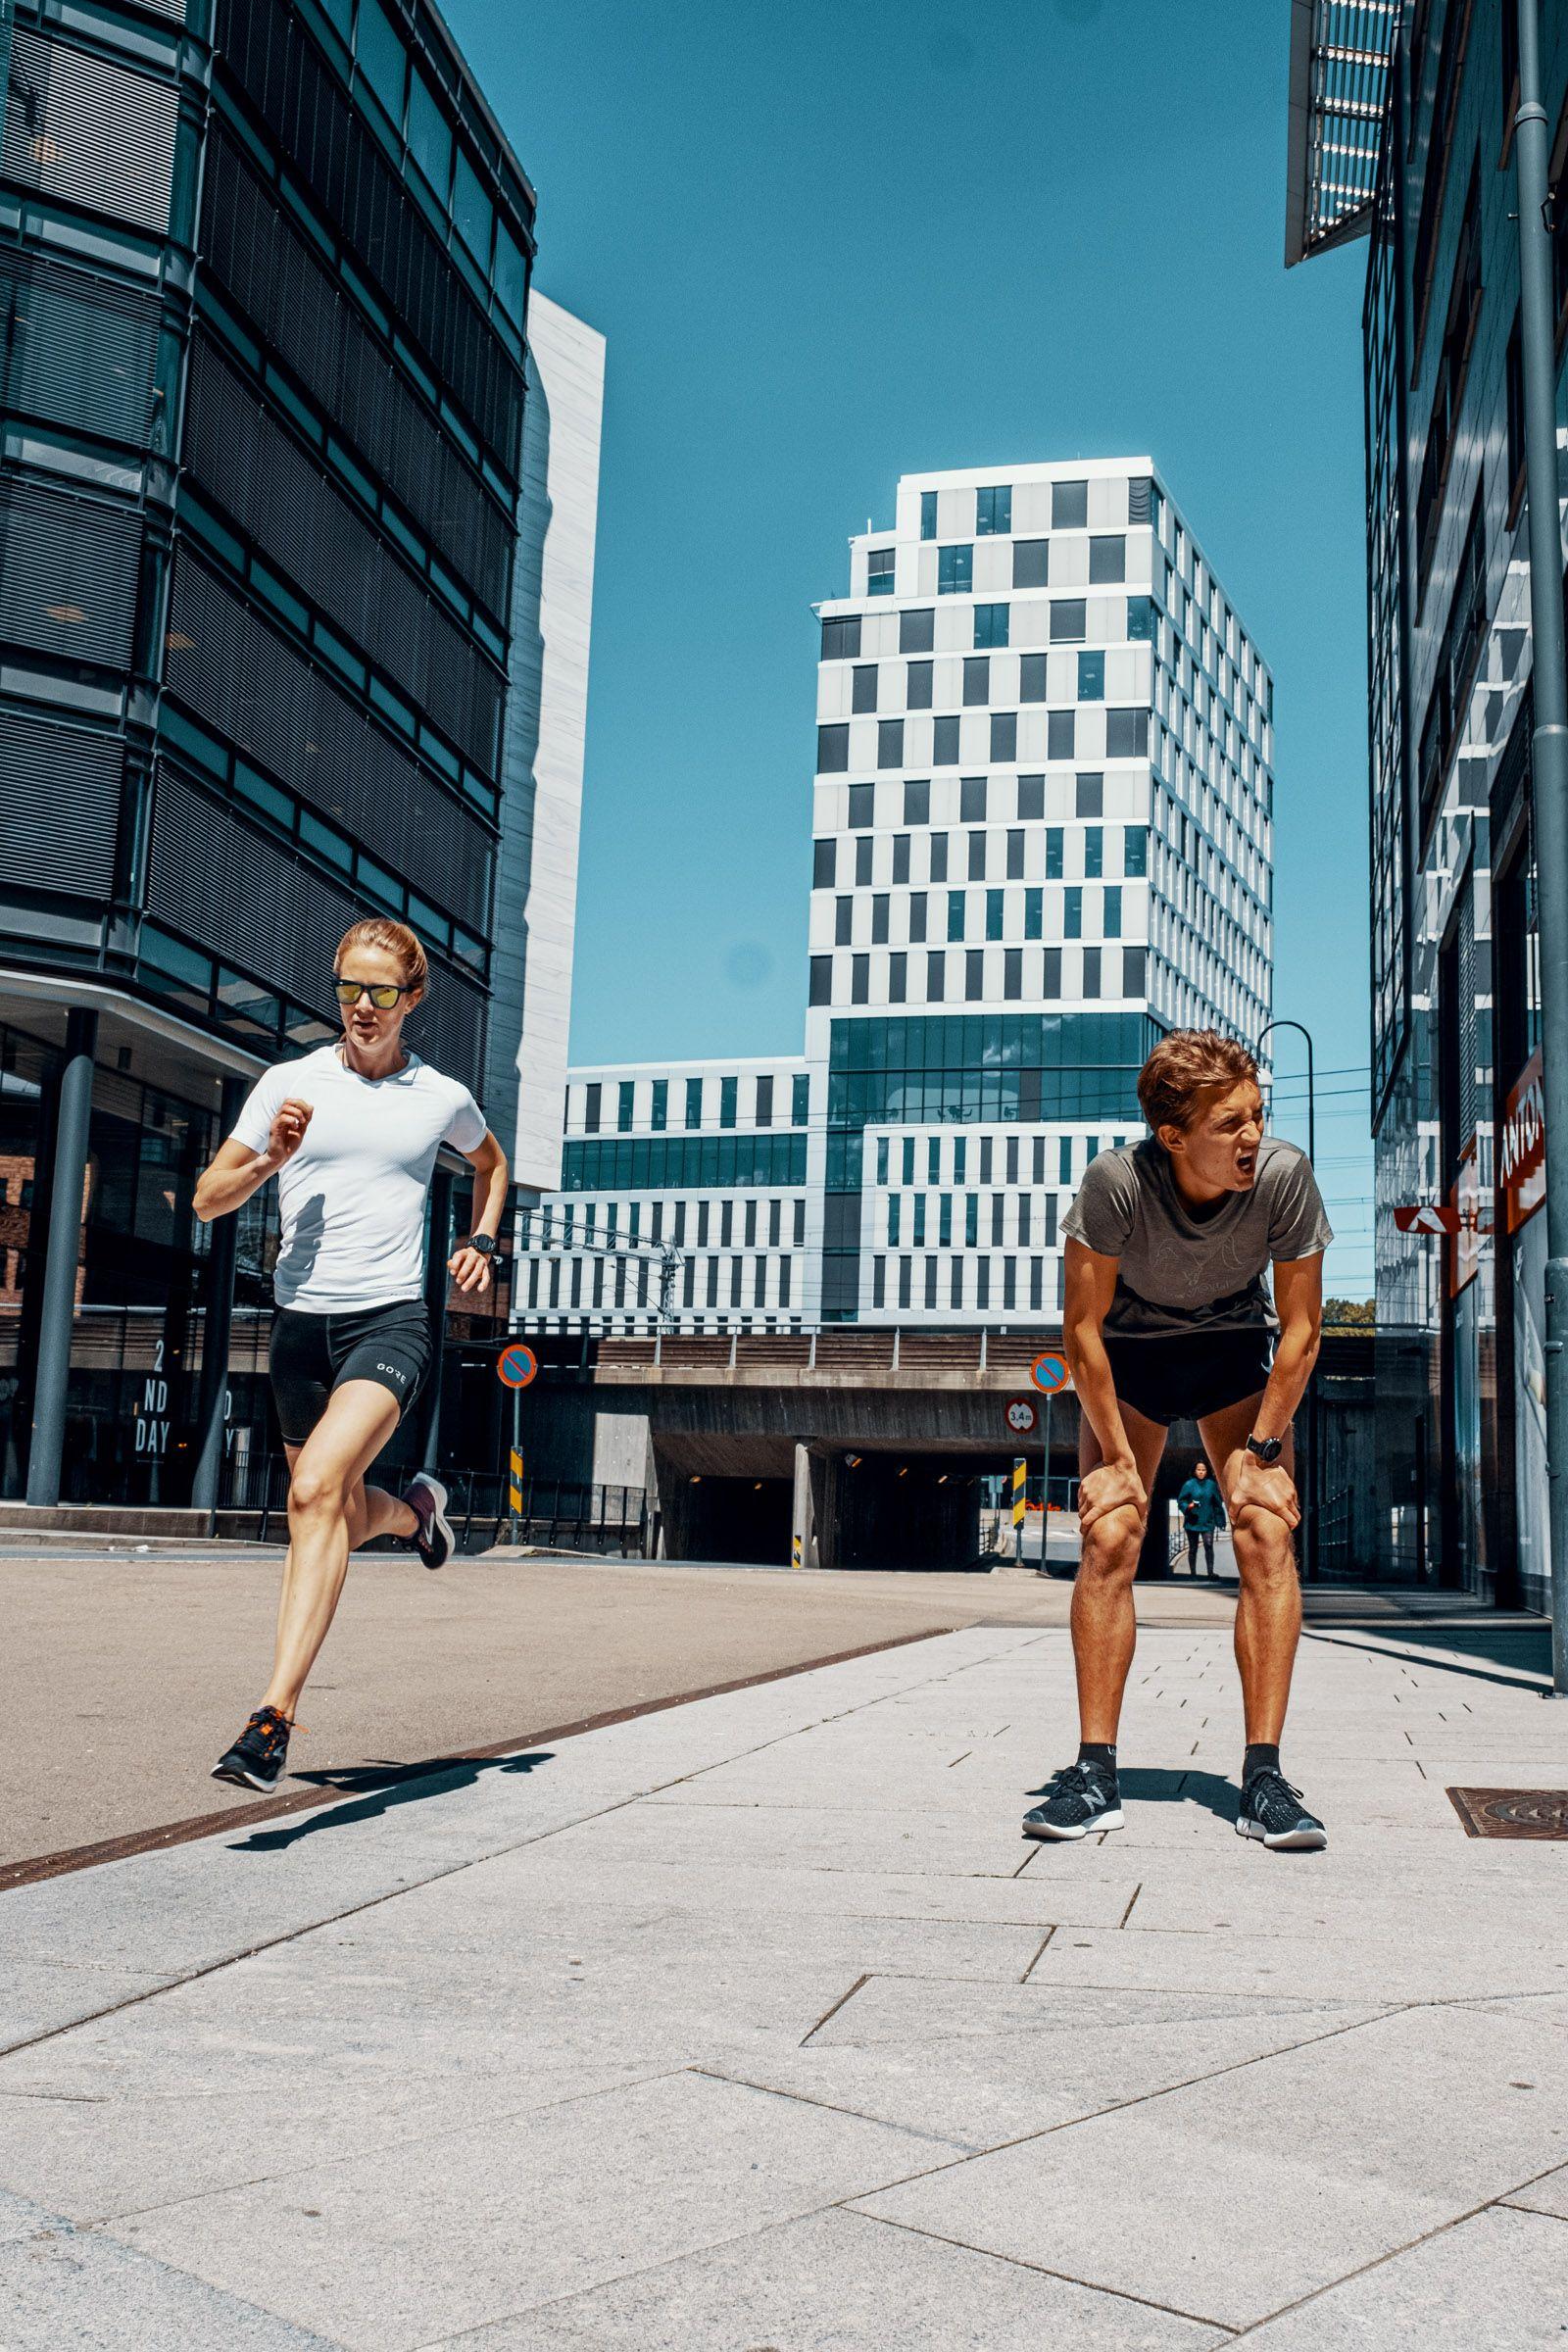 Ung dame og mann løper i byen